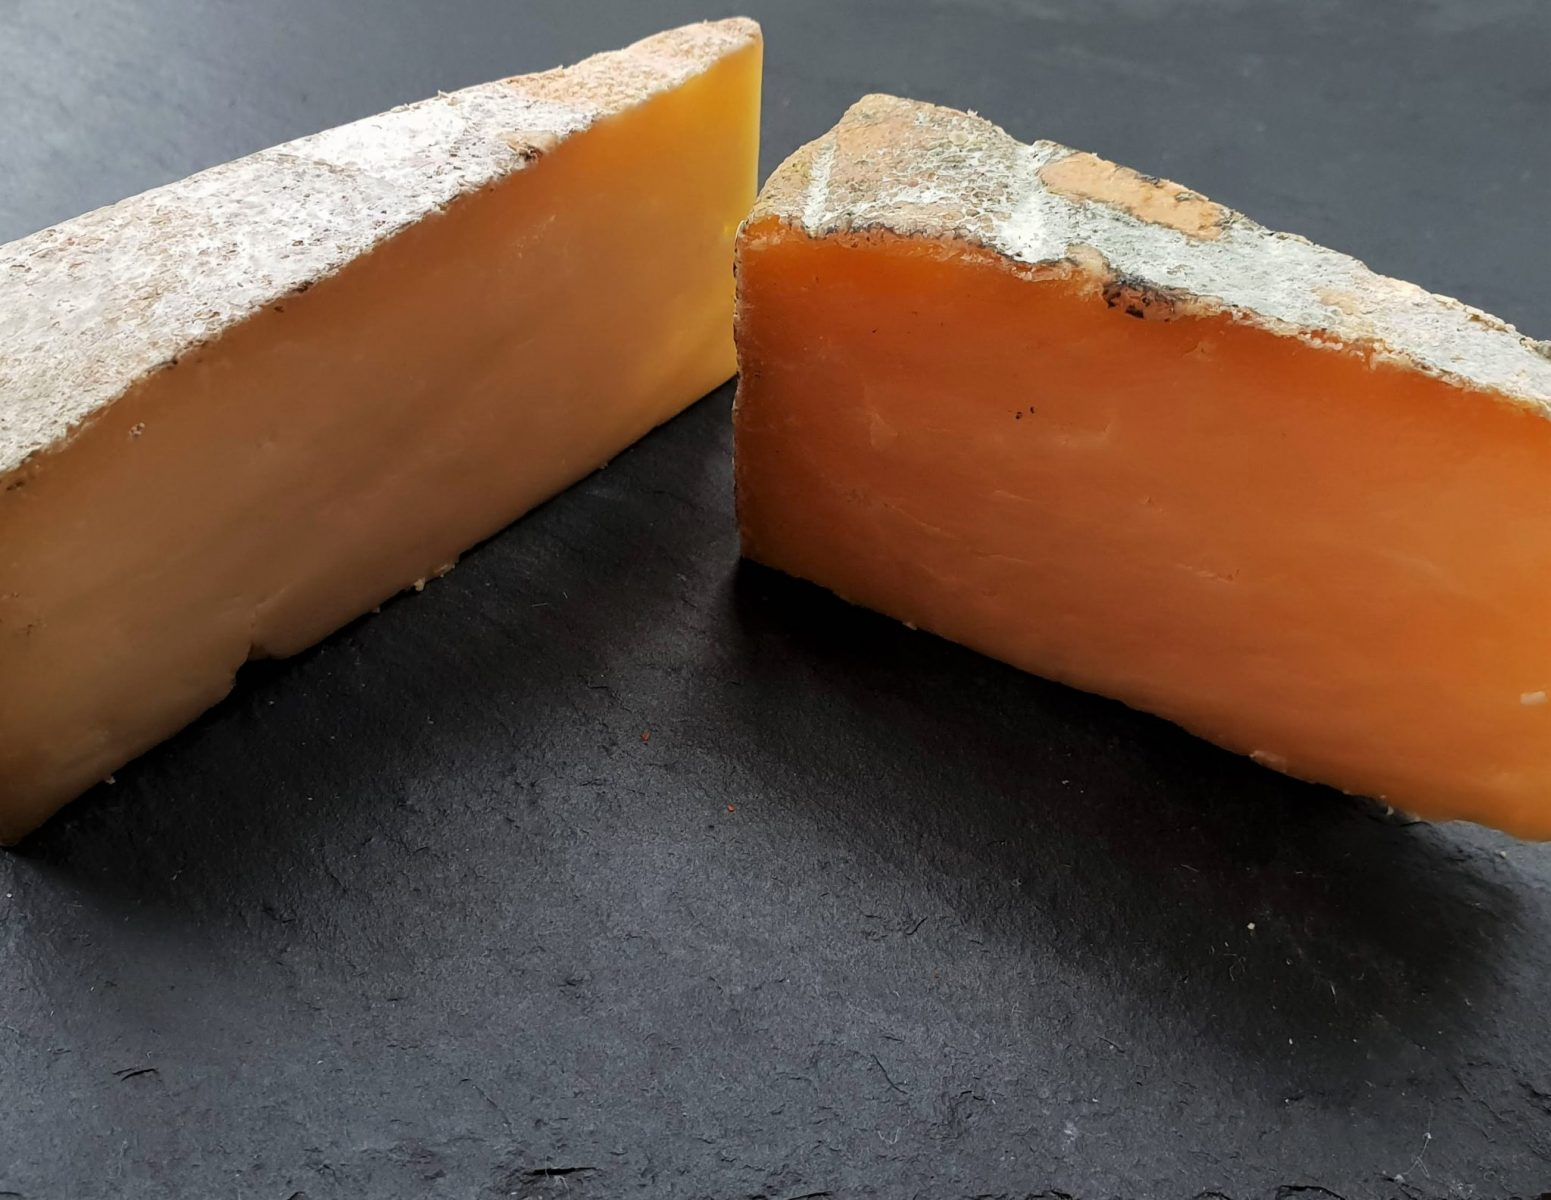 Gimblett cheese tasting